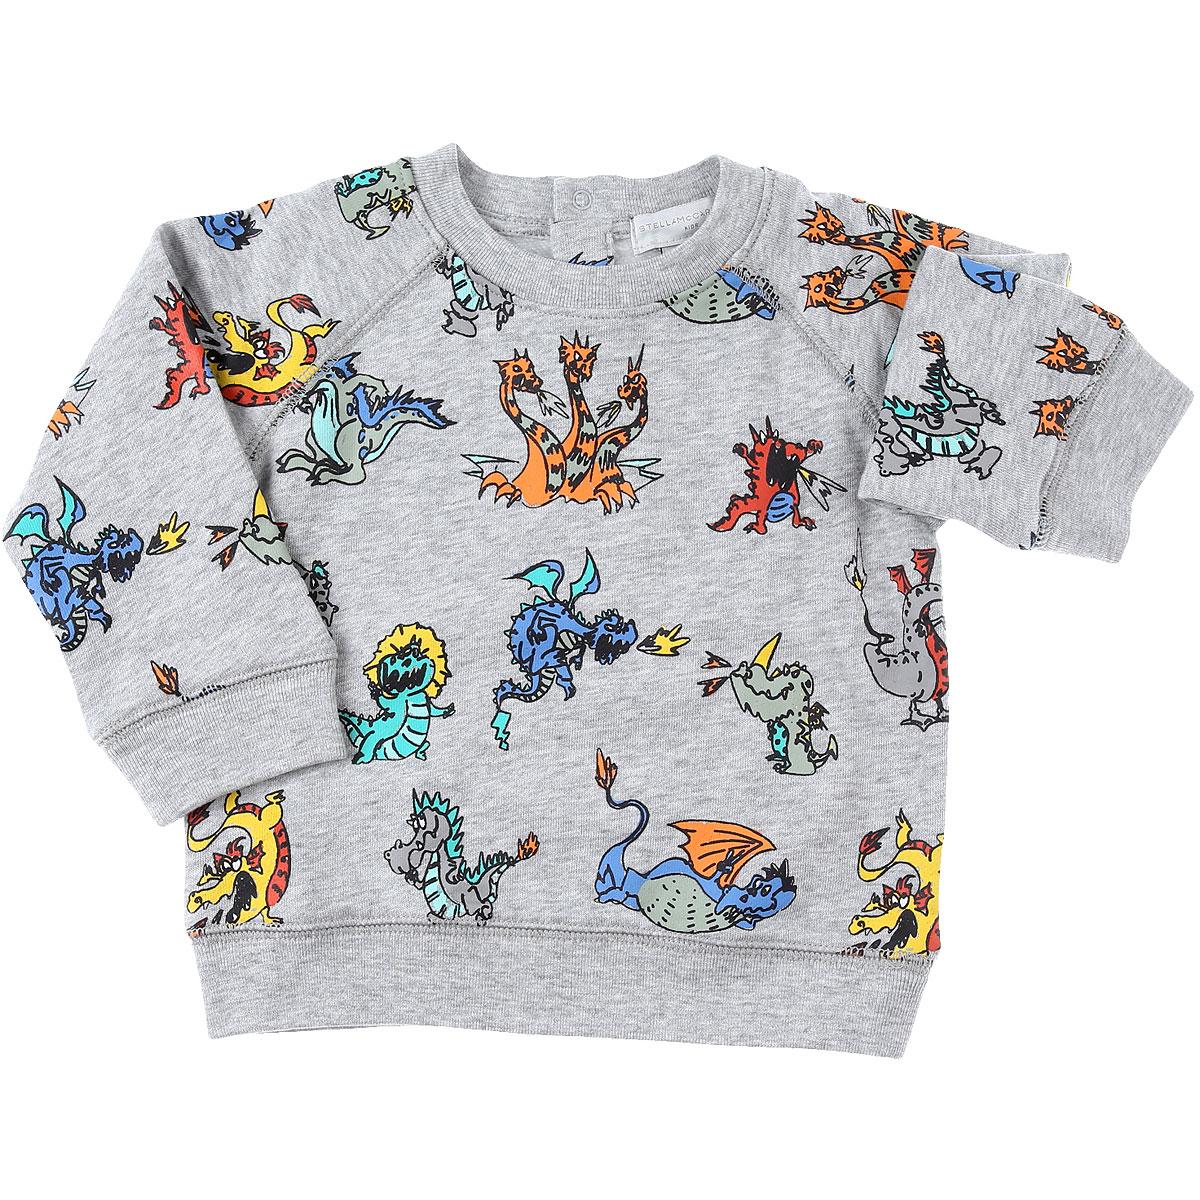 Stella McCartney Baby Sweatshirts & Hoodies for Boys On Sale, Grey, Cotton, 2019, 18M 6M 9M